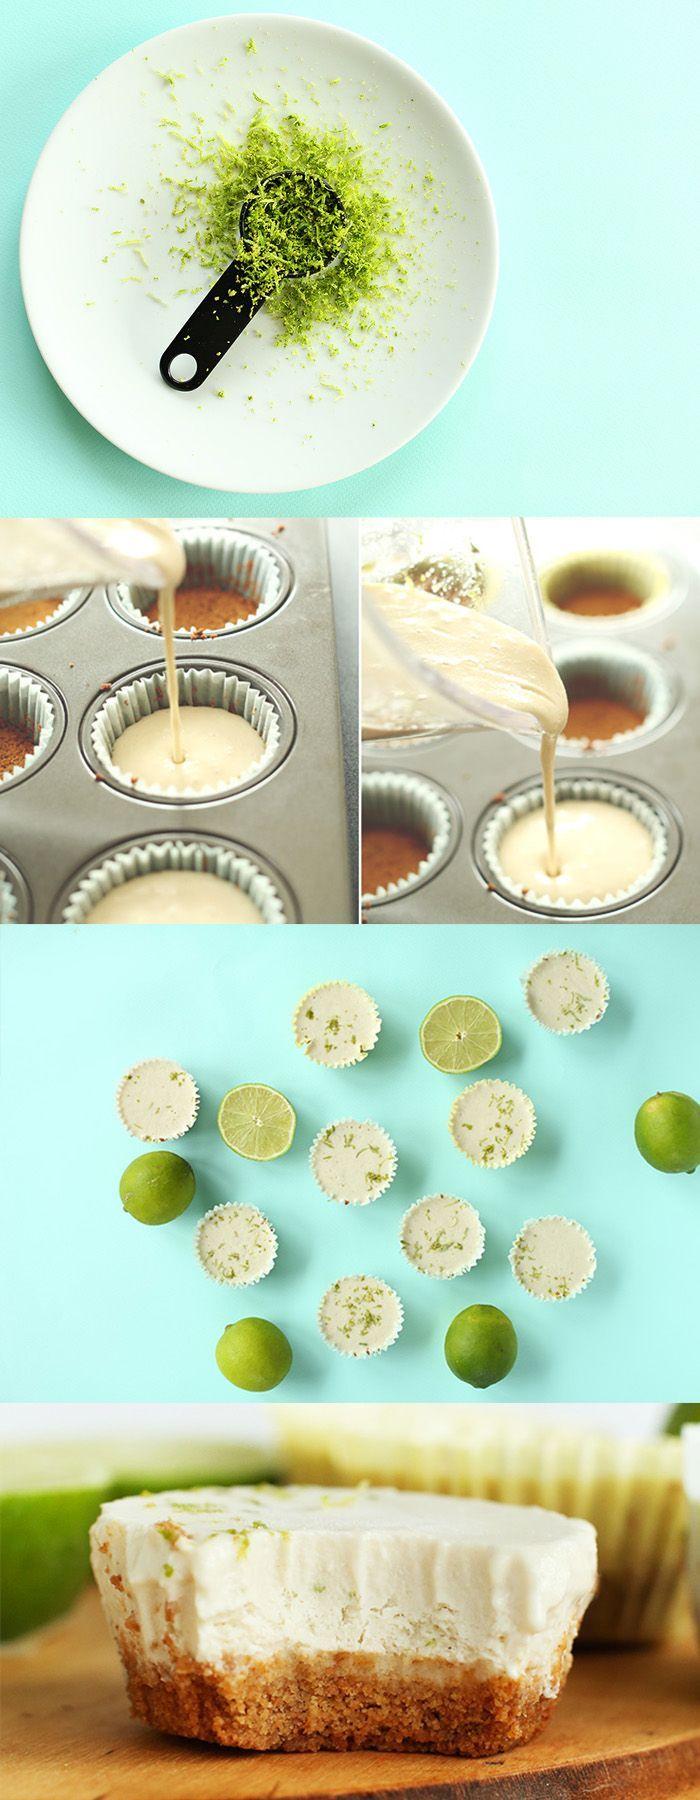 Vegan Key Lime Pie Minimalist Baker Recipes Recipe Vegan Key Lime Pie Lime Recipes Vegan Key Lime